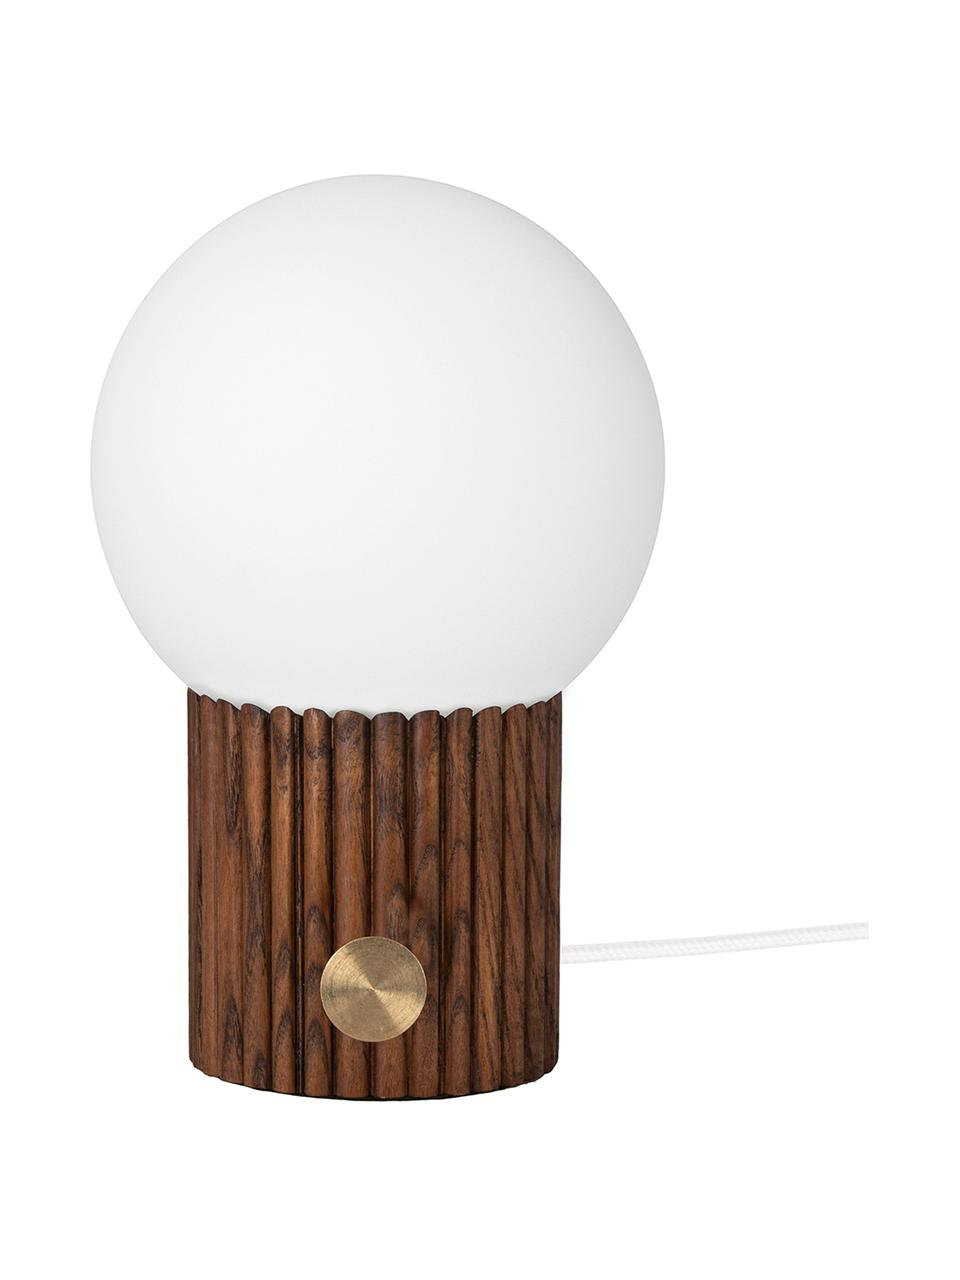 Lampe à poser design Hubble, Brun, blanc